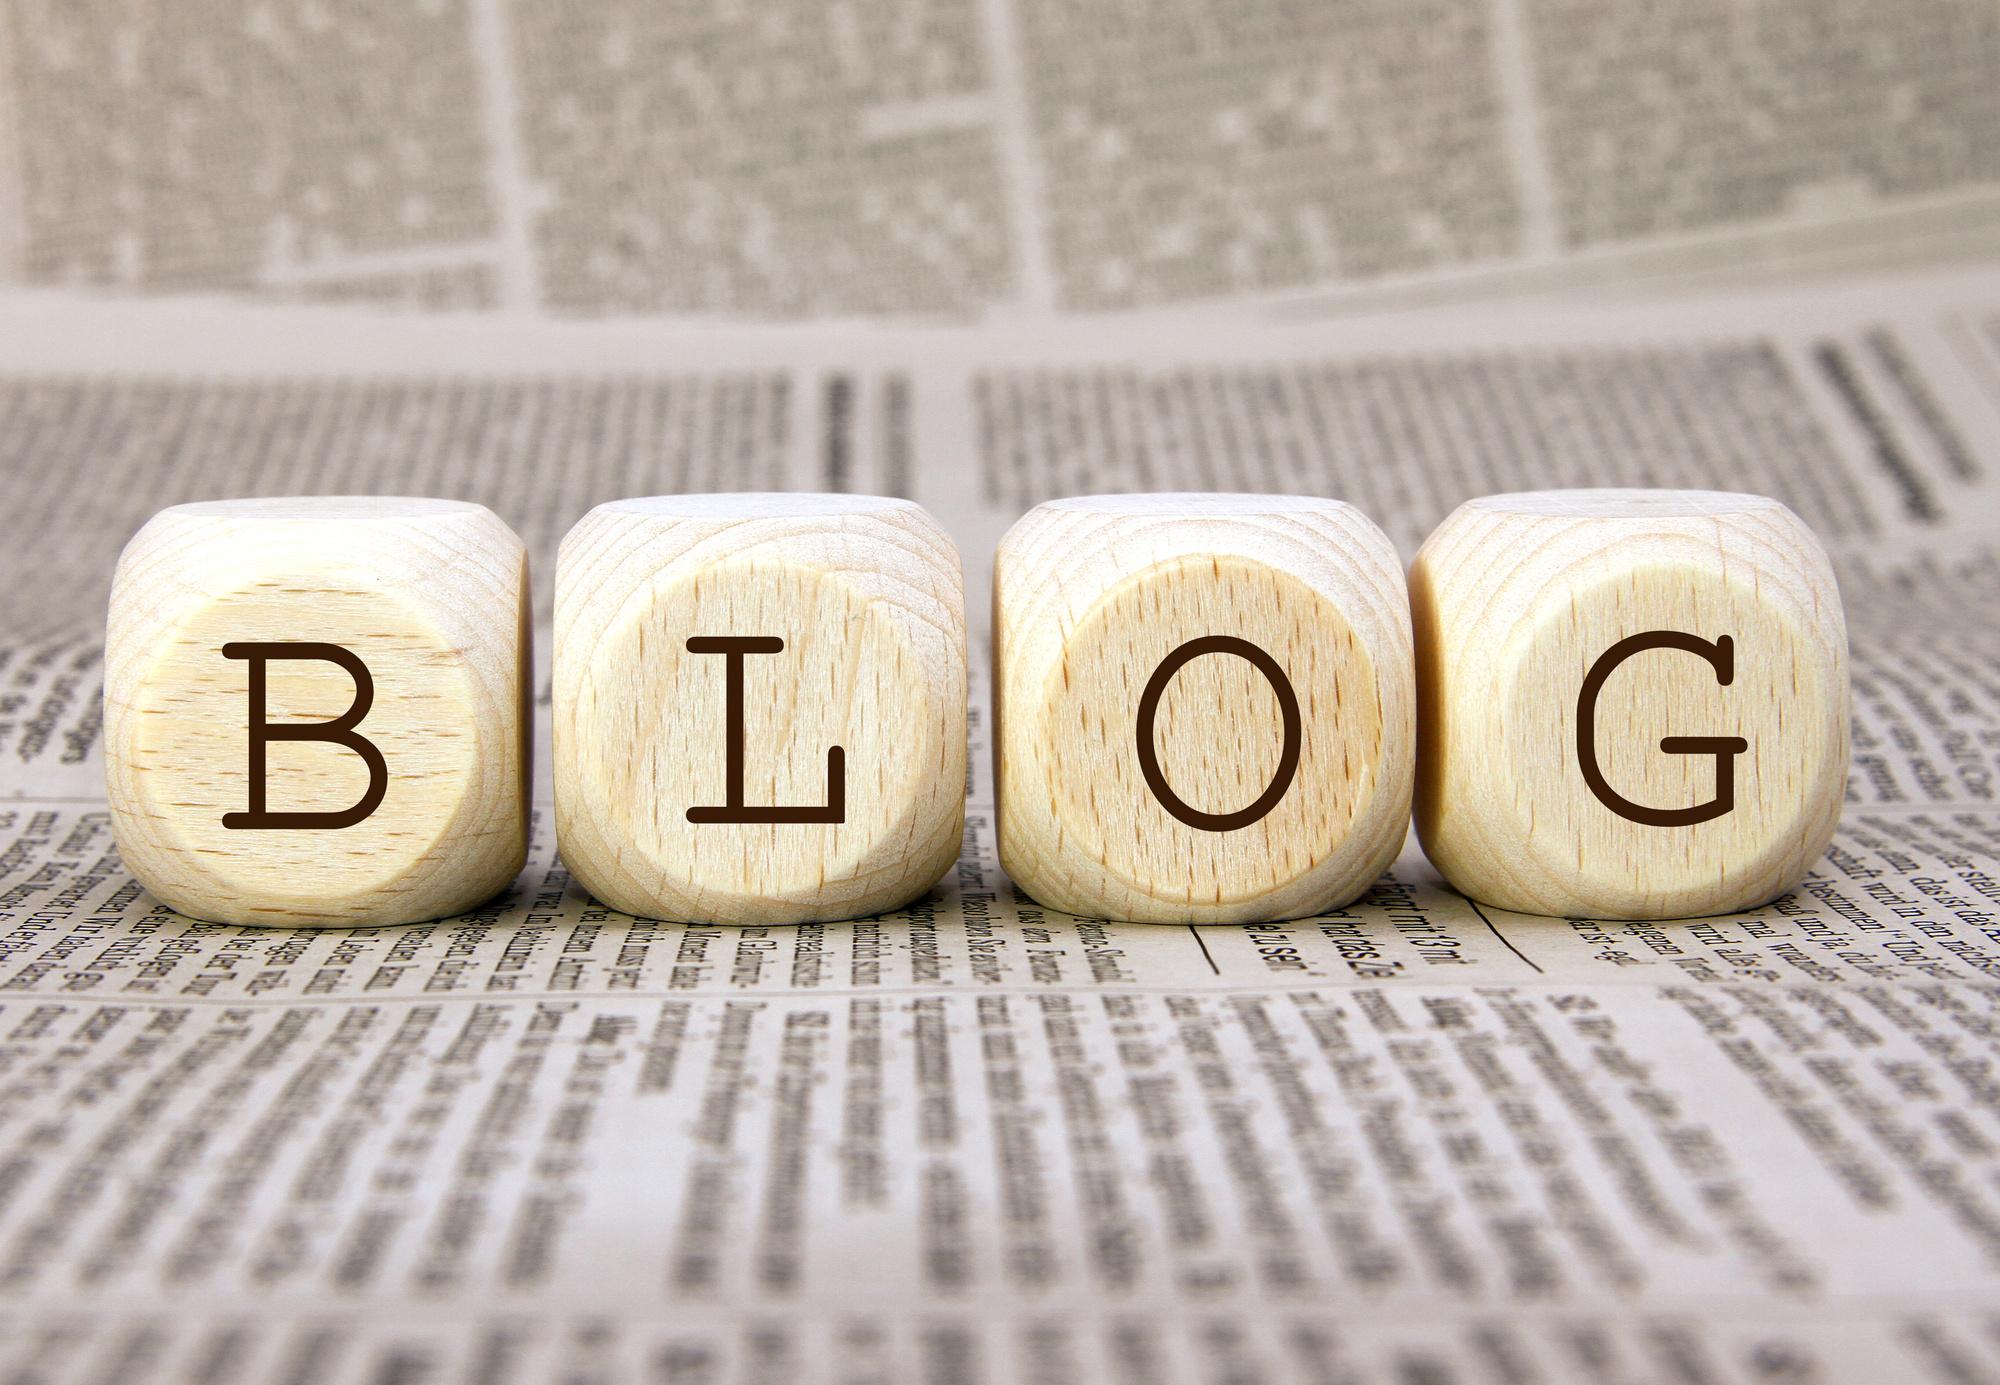 Картинки со словом блоггеры